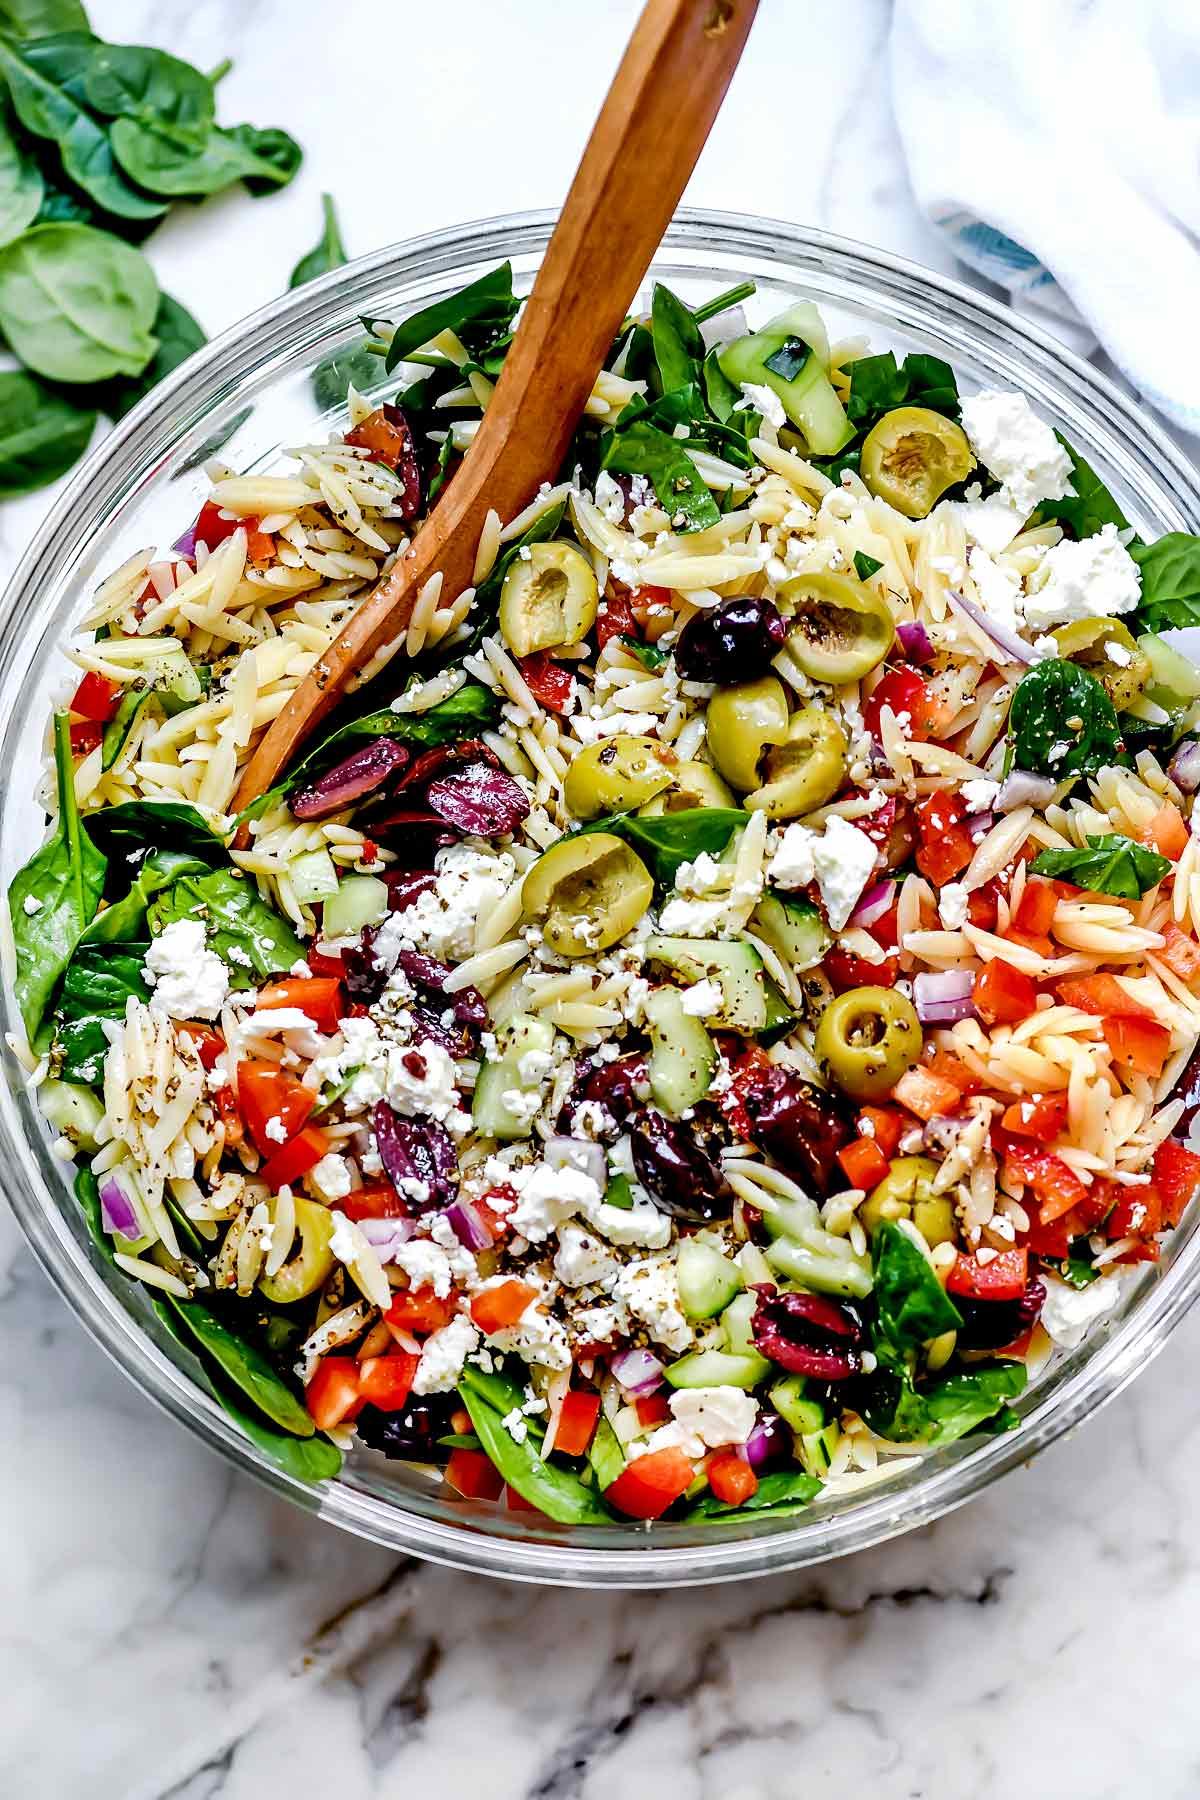 Mediterranean Orzo Salad foodiecrush.com #salad #orzo #olives #mediterannean #pasta #pastasalad #healthy #recipes